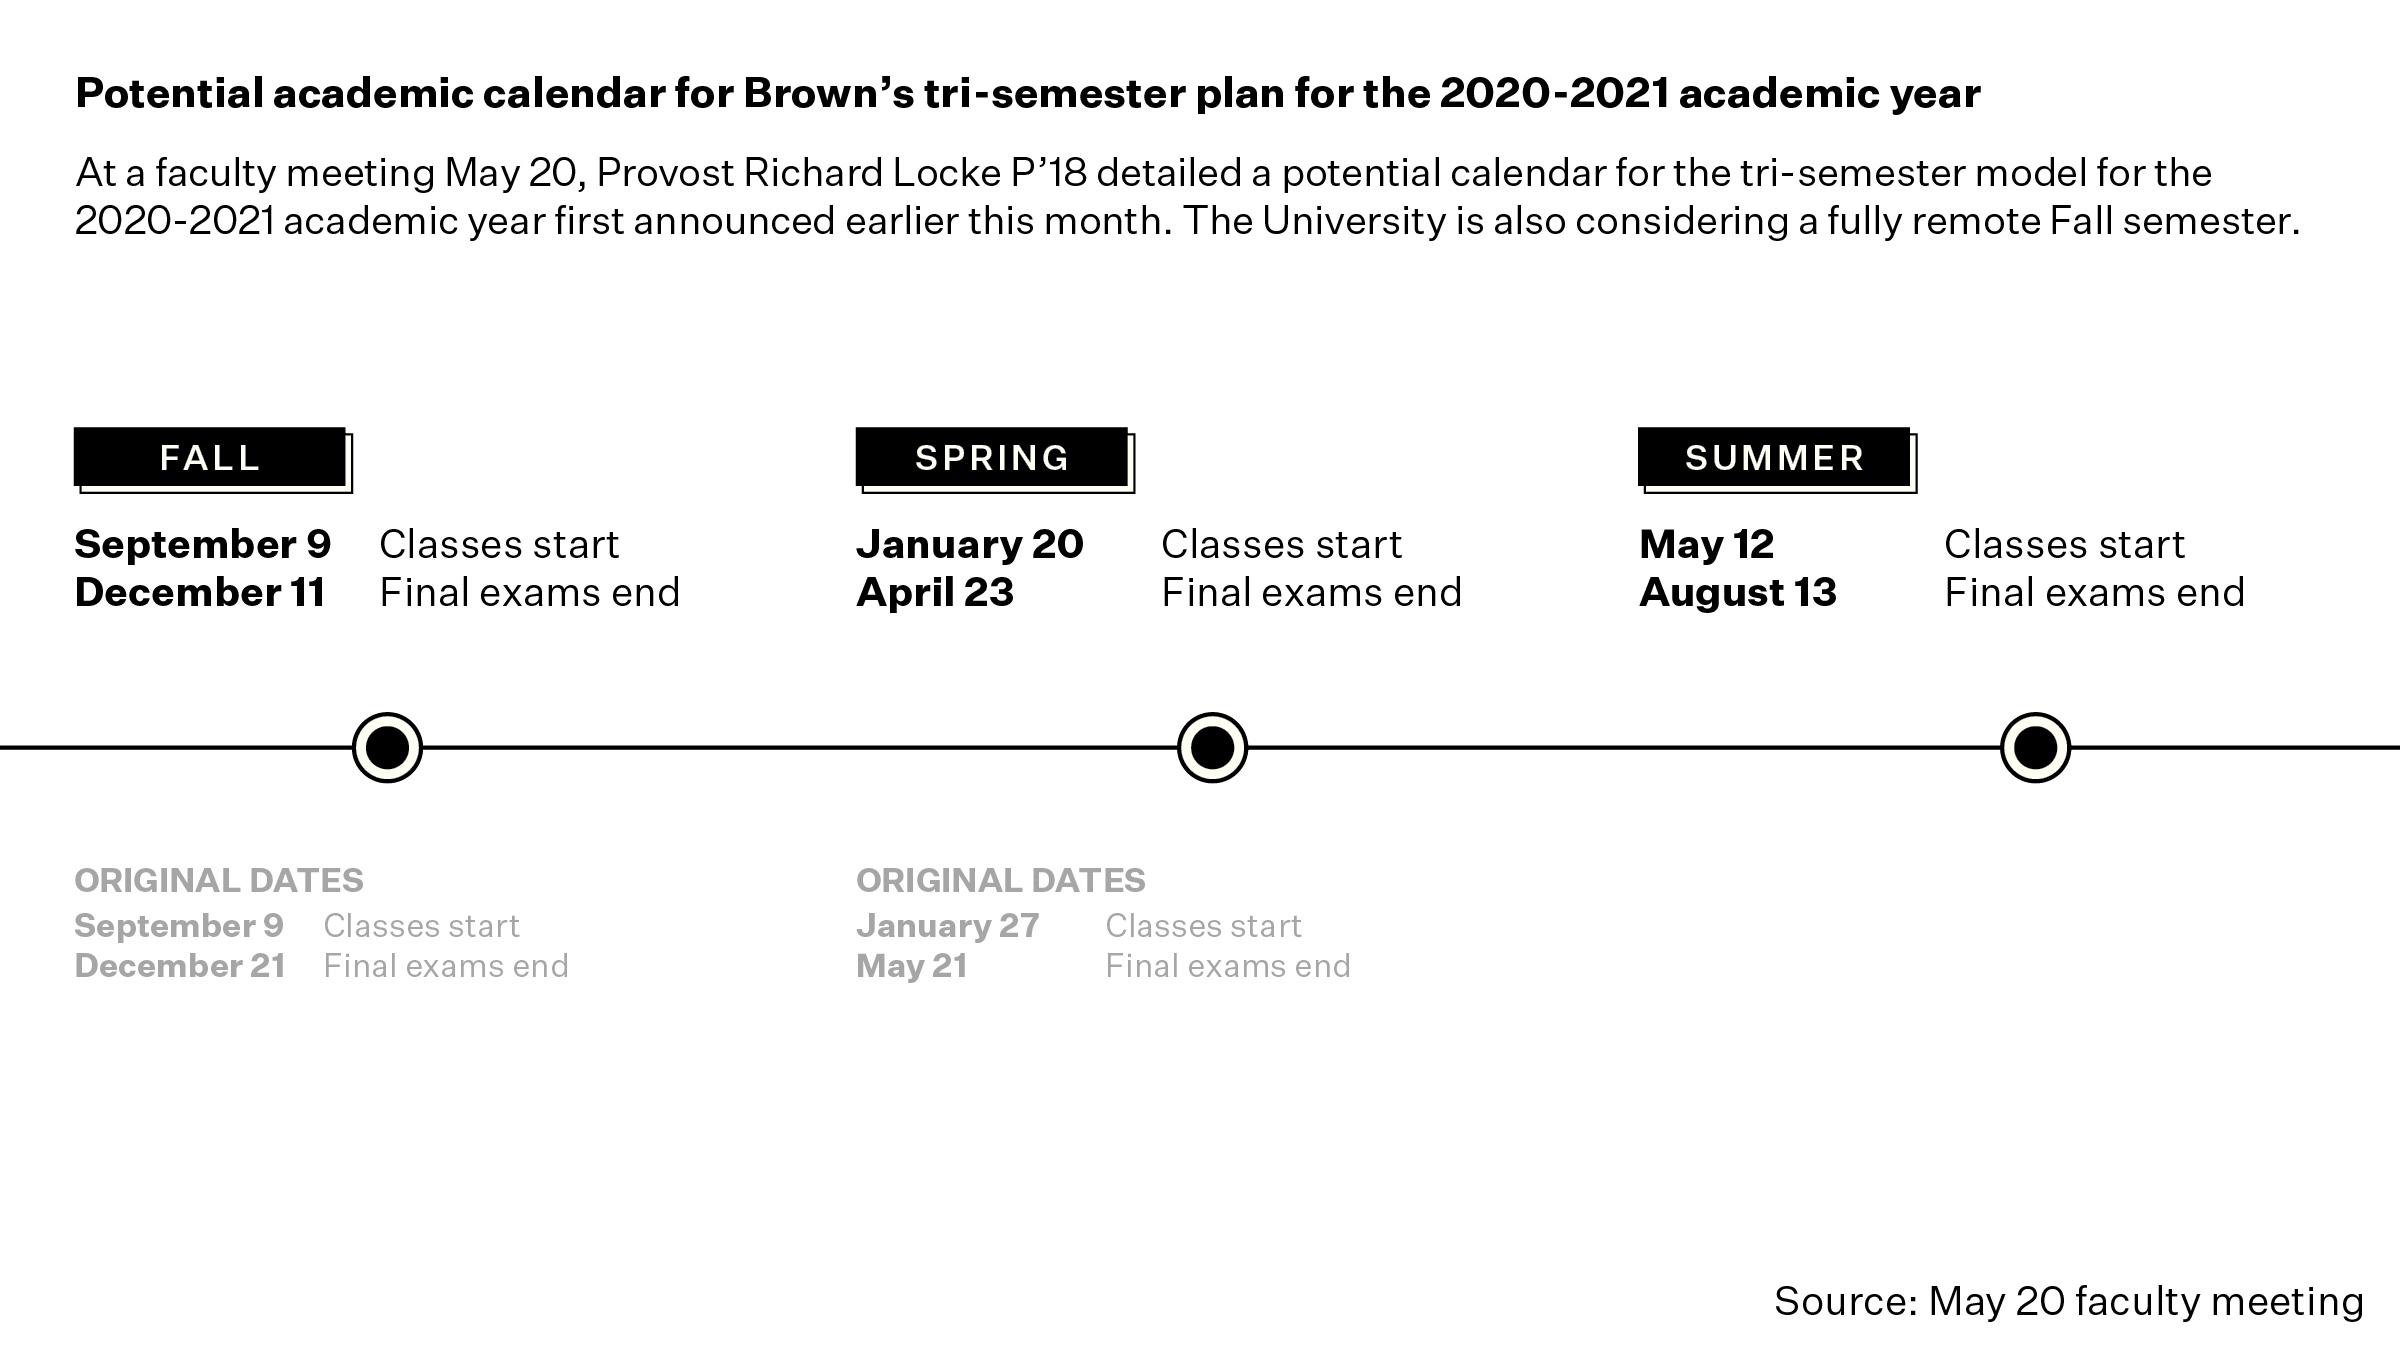 Johns Hopkins Academic Calendar 2021 | Calendar Page With Regard To University Of Rhode Island Calendar 2021 2020